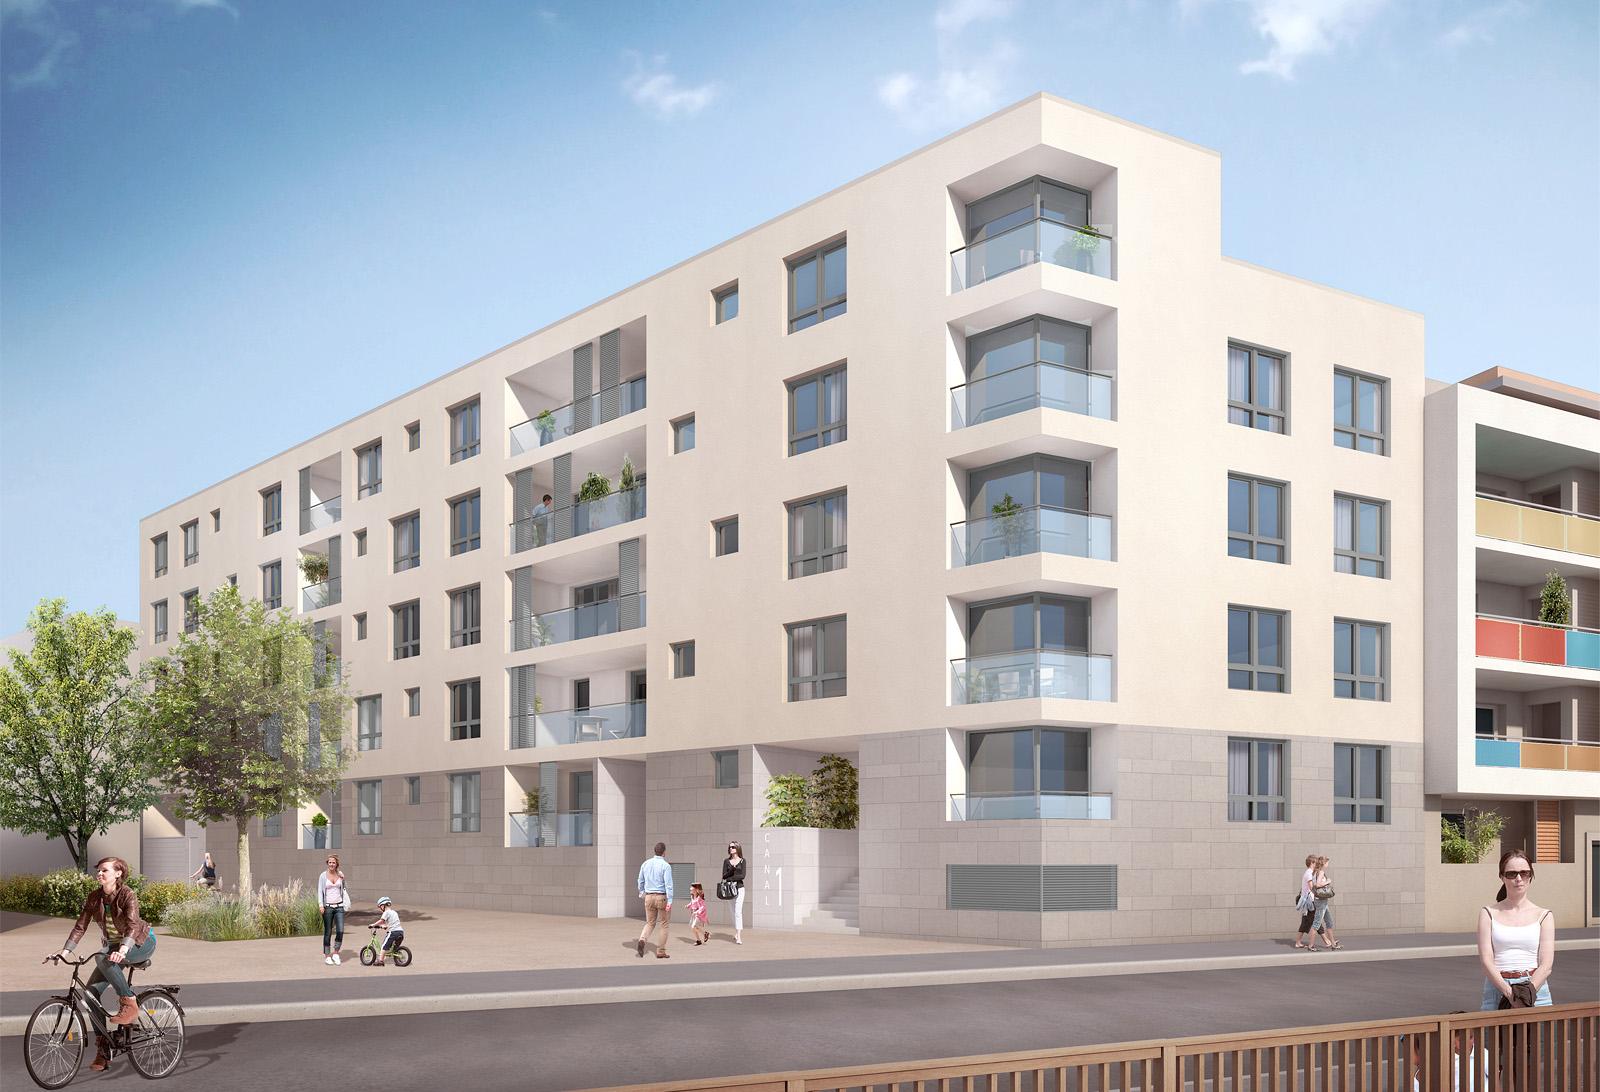 180109-jardins-arsenal-appartement-toit-bourguignon.jpg